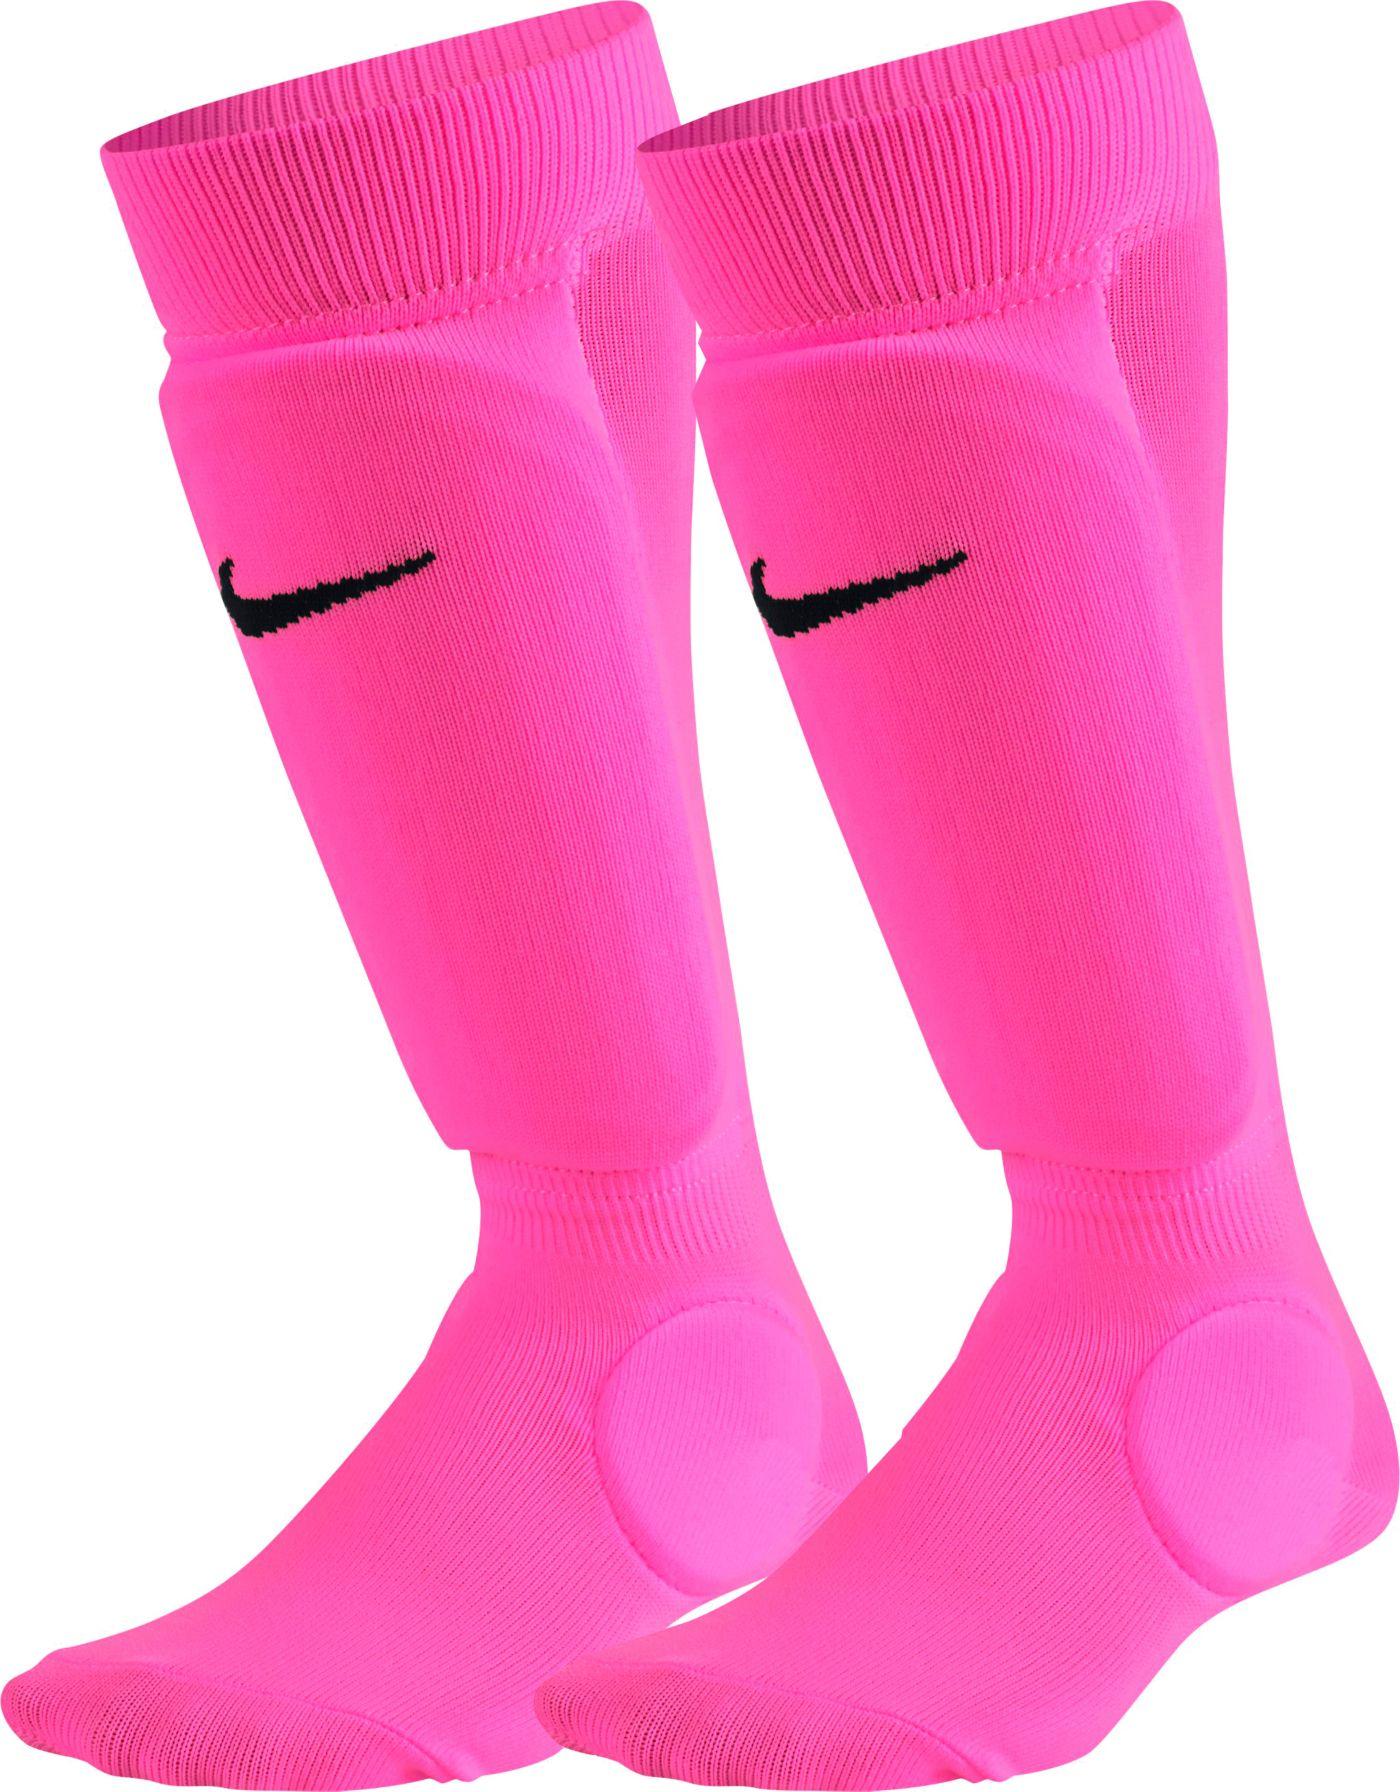 Nike Youth Soccer Shin Socks